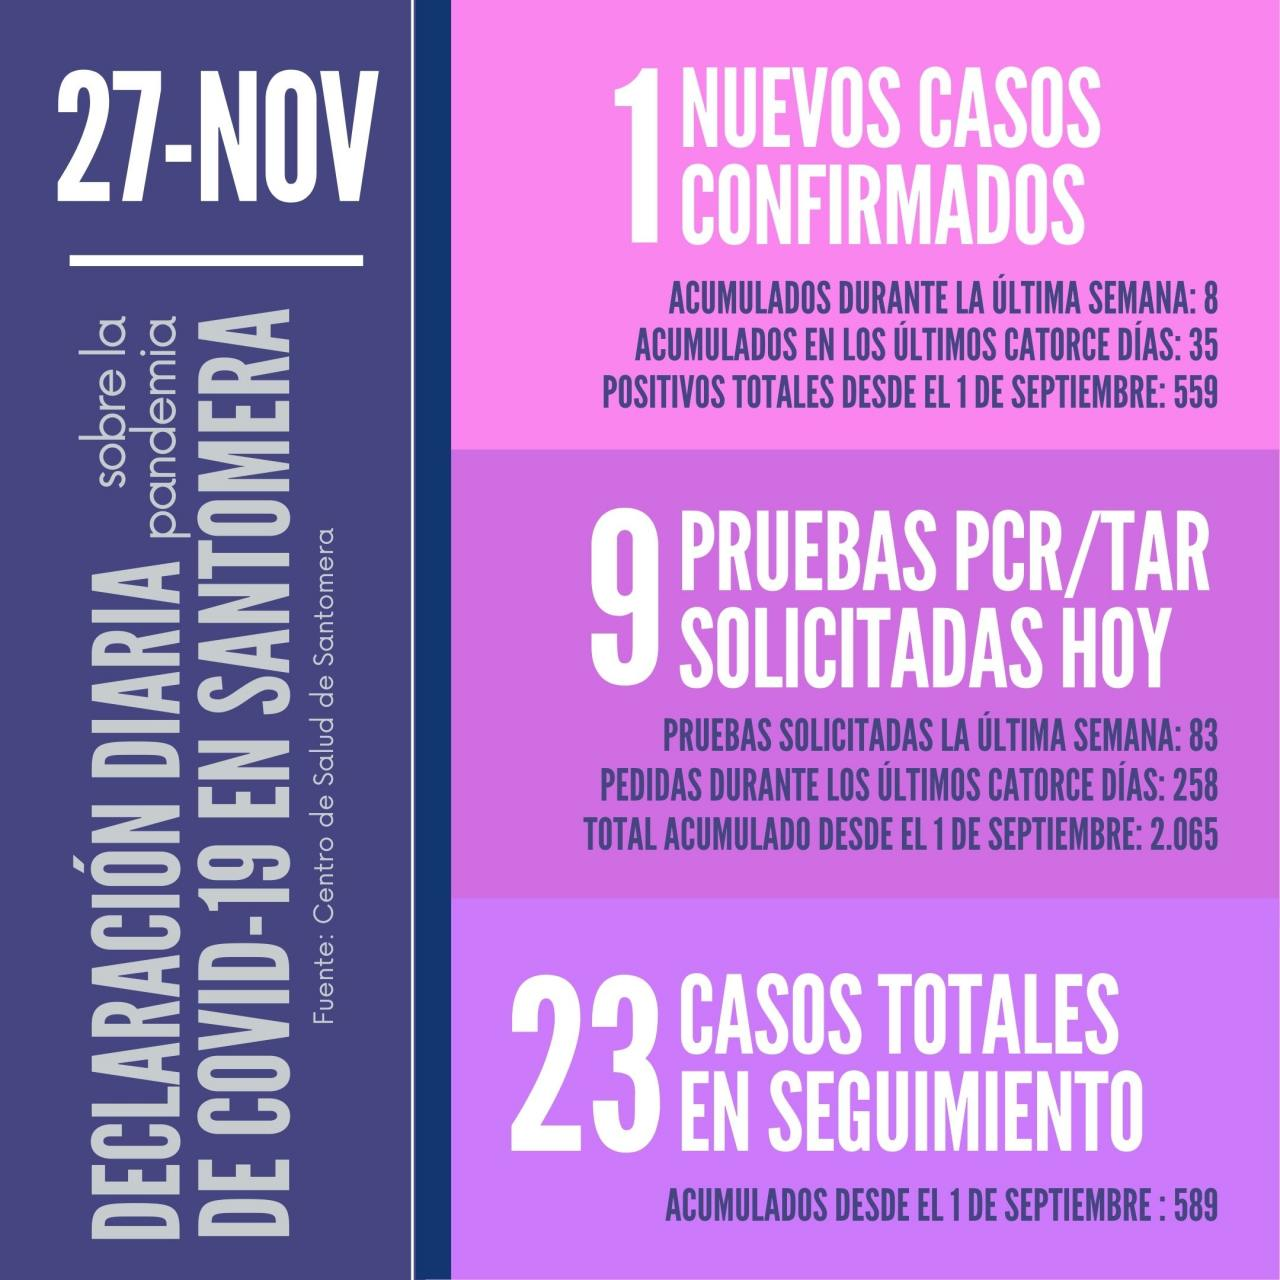 20201127_Datos-COVID-19-Santomera